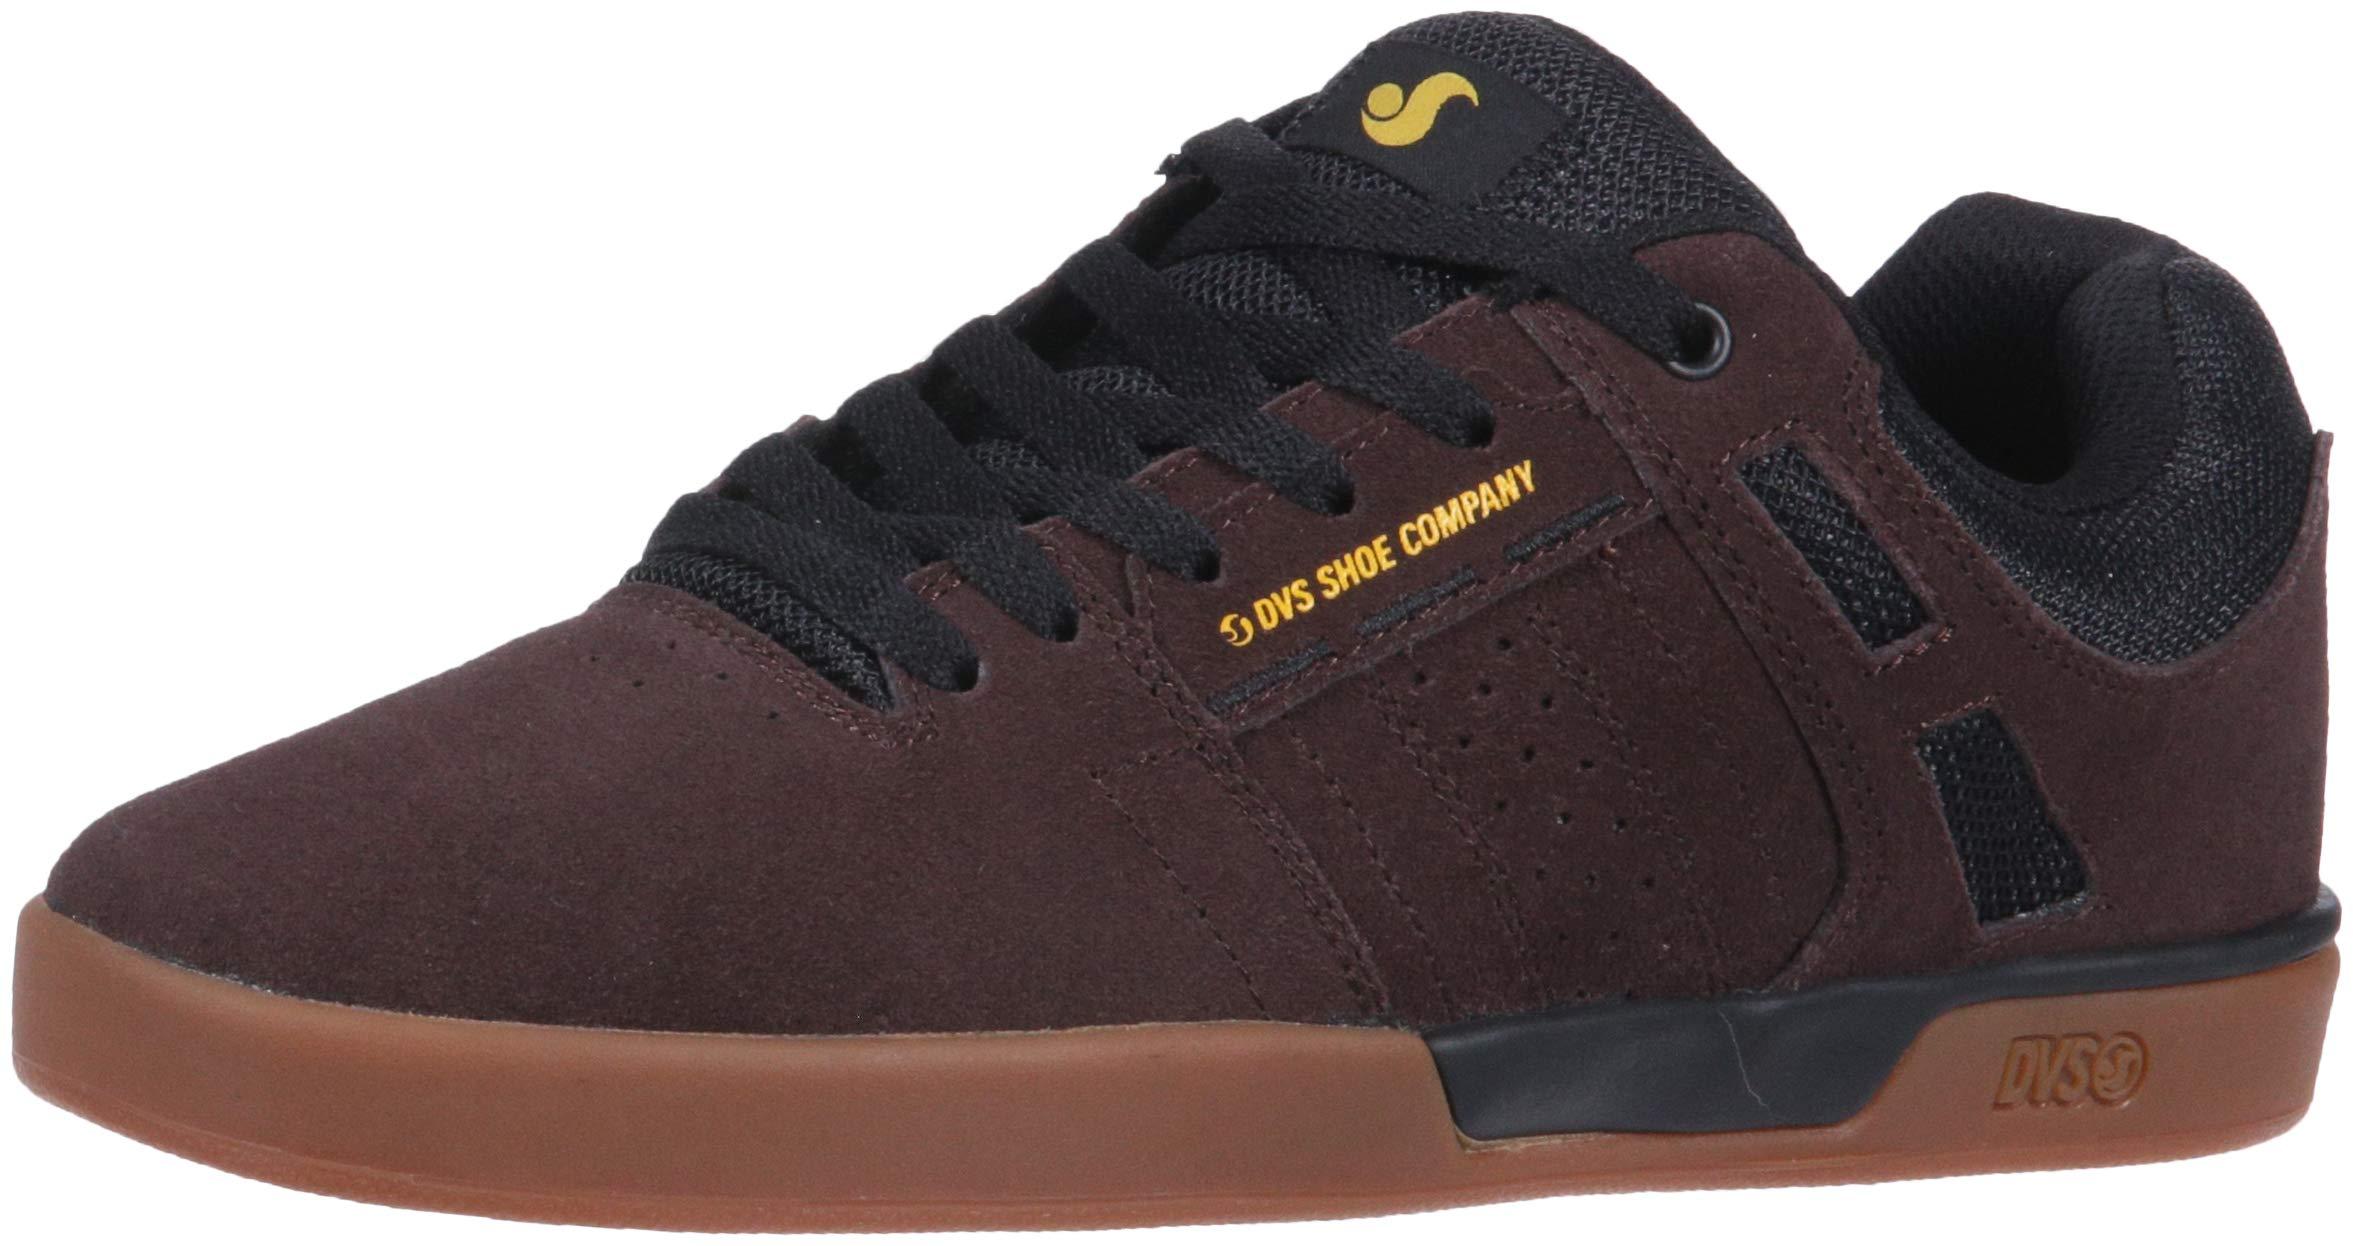 2e8f70b5e53 Galleon mens getz skate shoe chocolate brown black suede getz medium jpg  2353x1246 Dvs brown shoes